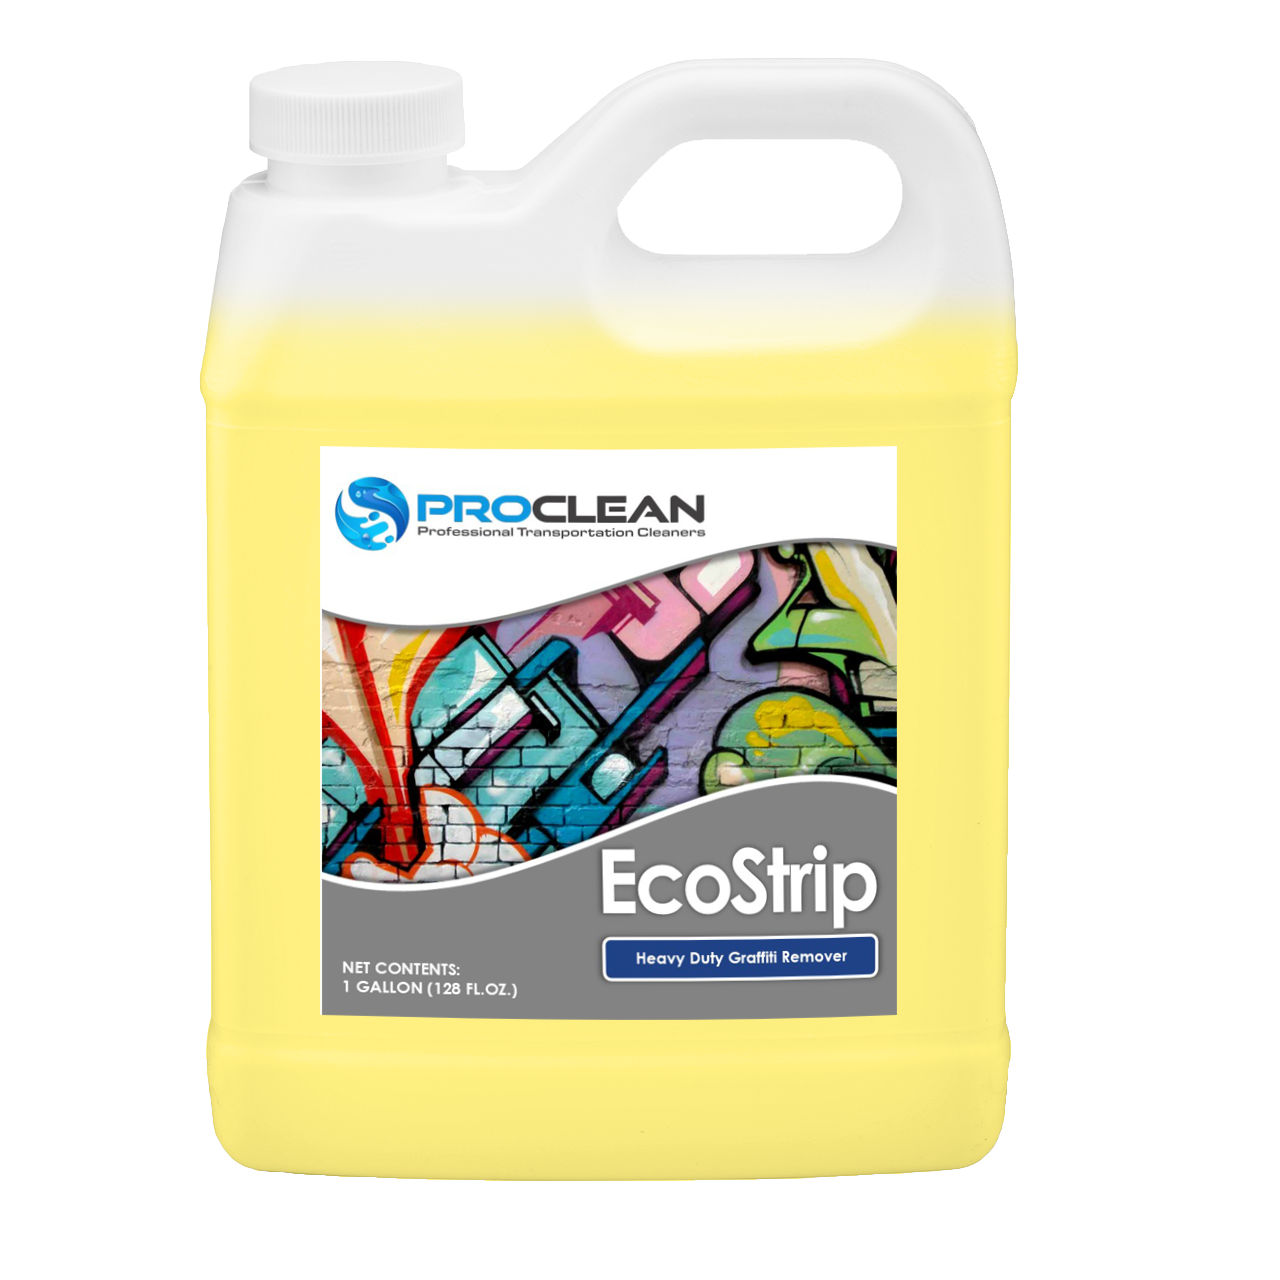 EcoStrip